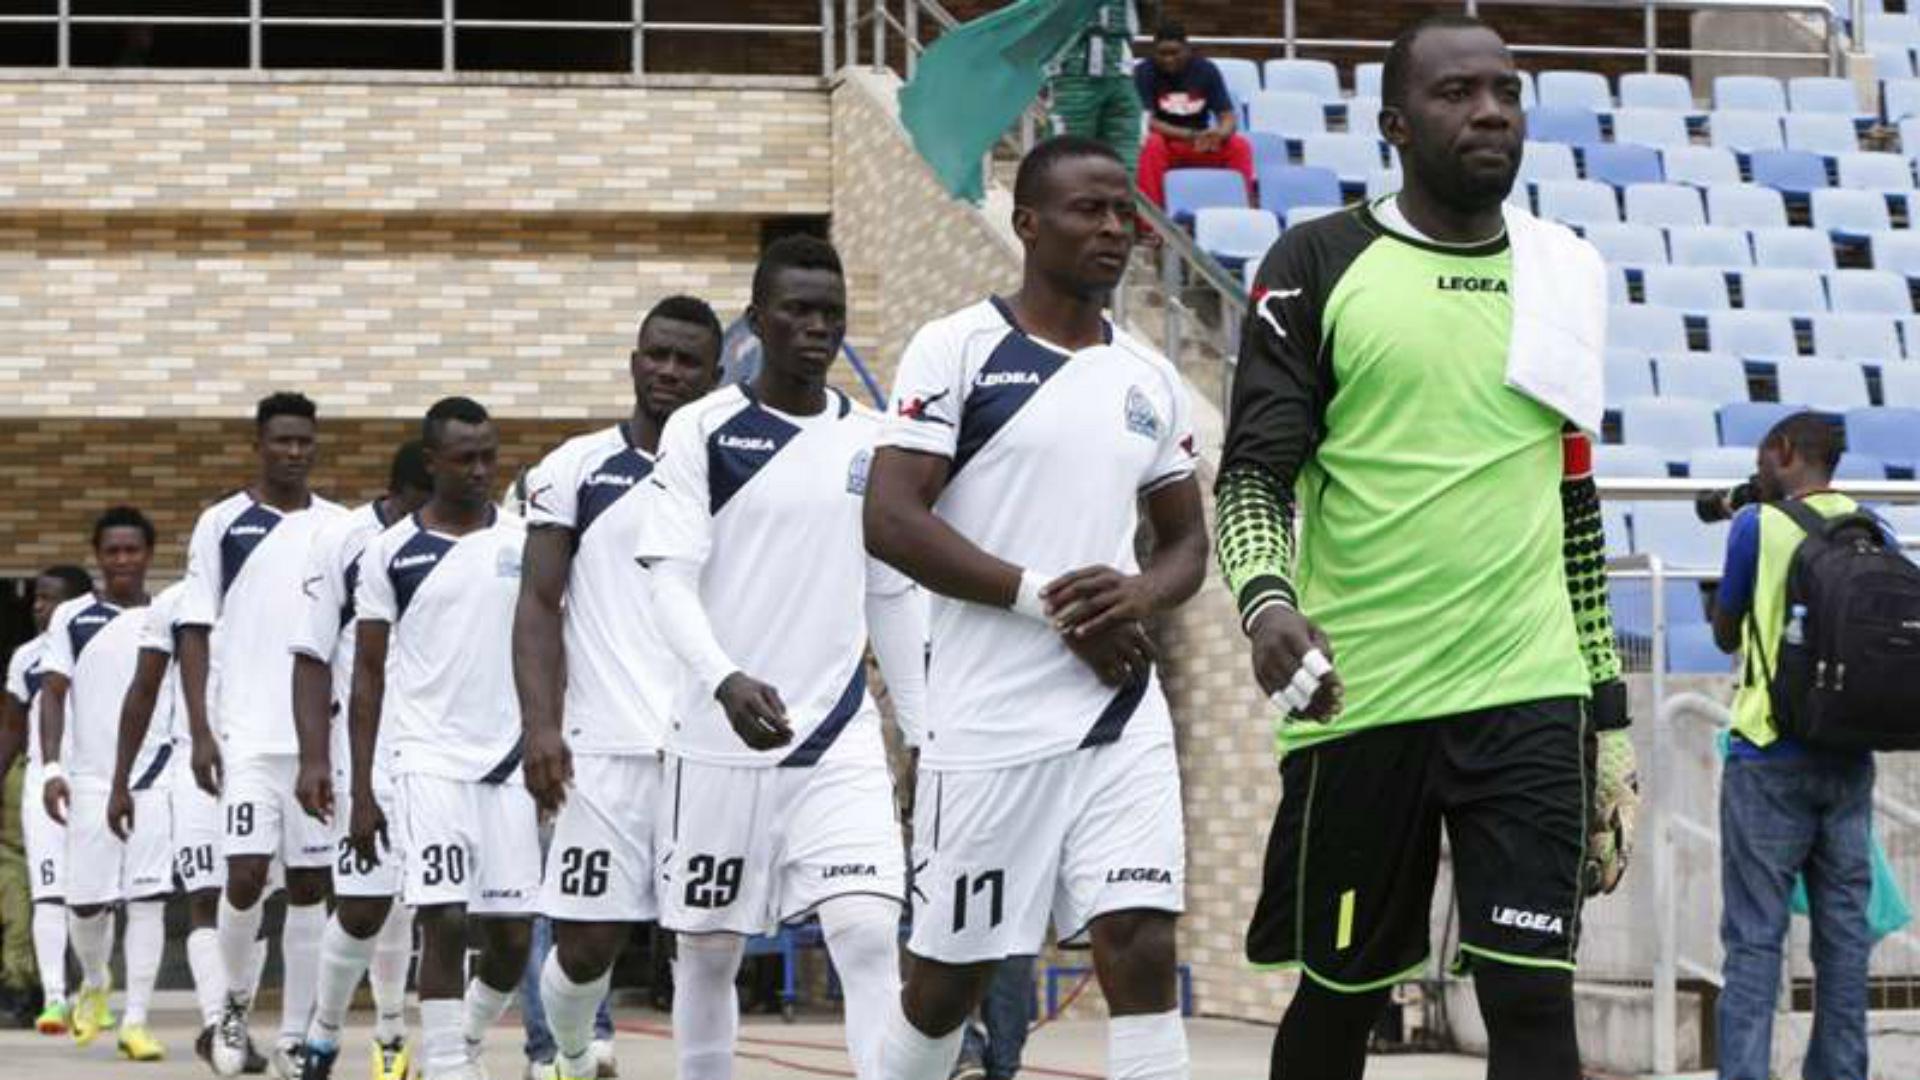 Jerim Onyango leads Gor Mahia in Tanzania during Cecafa tournament